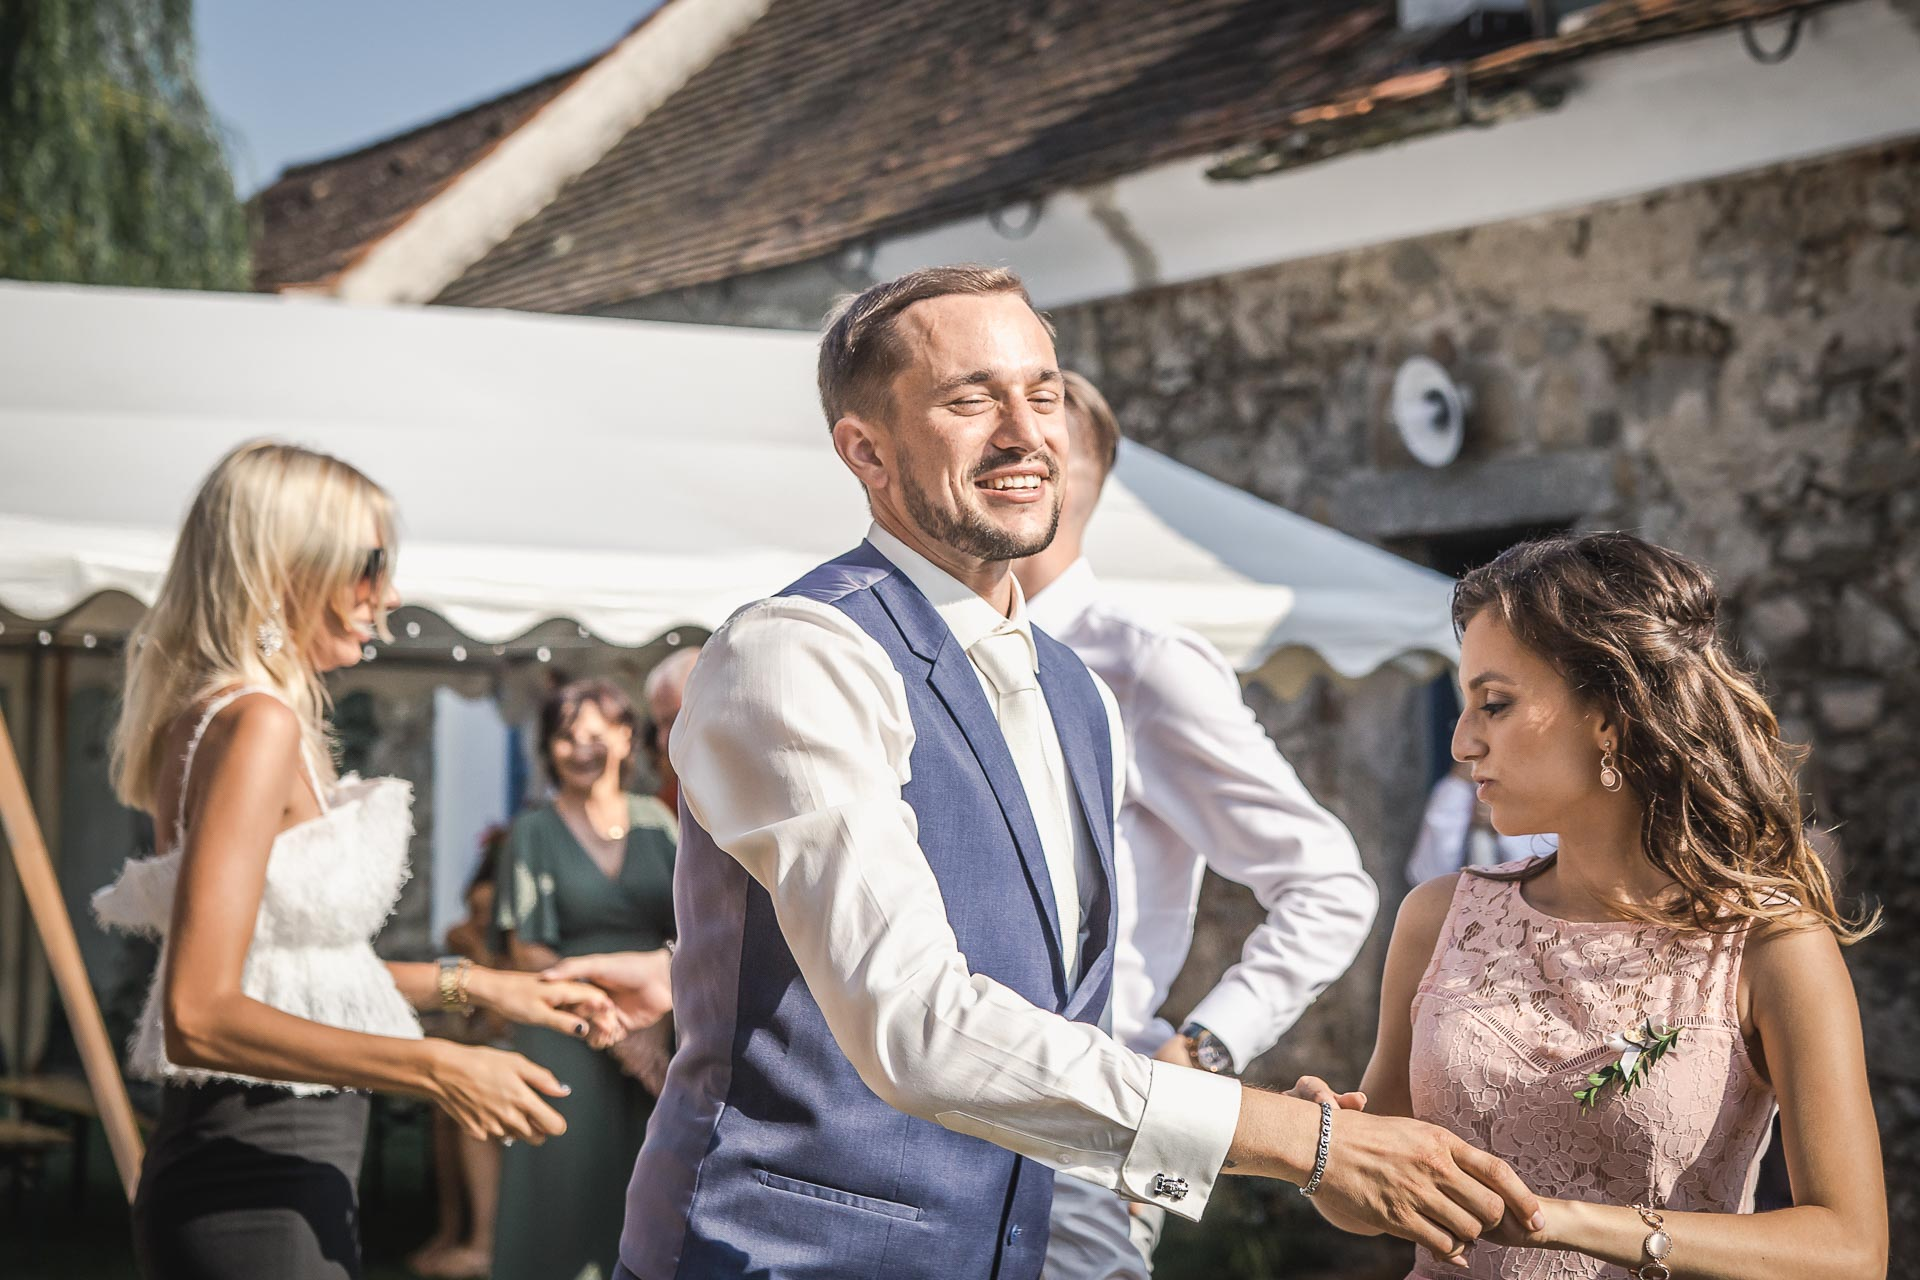 svatební-fotograf-wedding-svatebni-video-orlík-vltava-kostel-statek-stodola-boho-svatba-Beautyfoto-452